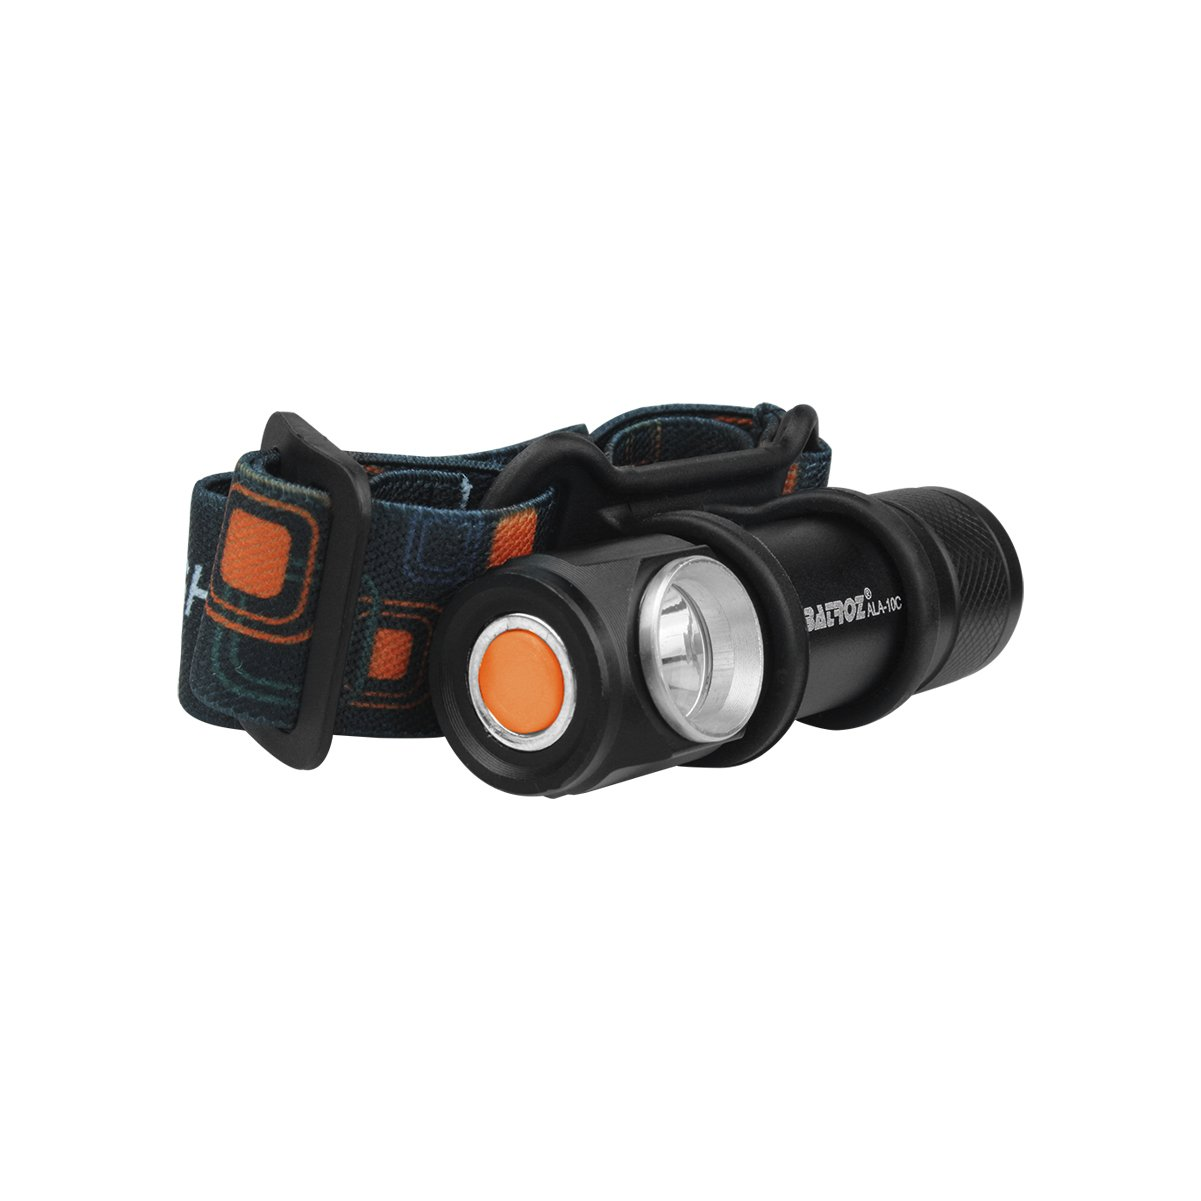 Lanterna de cabeça recarregável Led ALA-10C - Albatroz Fishing